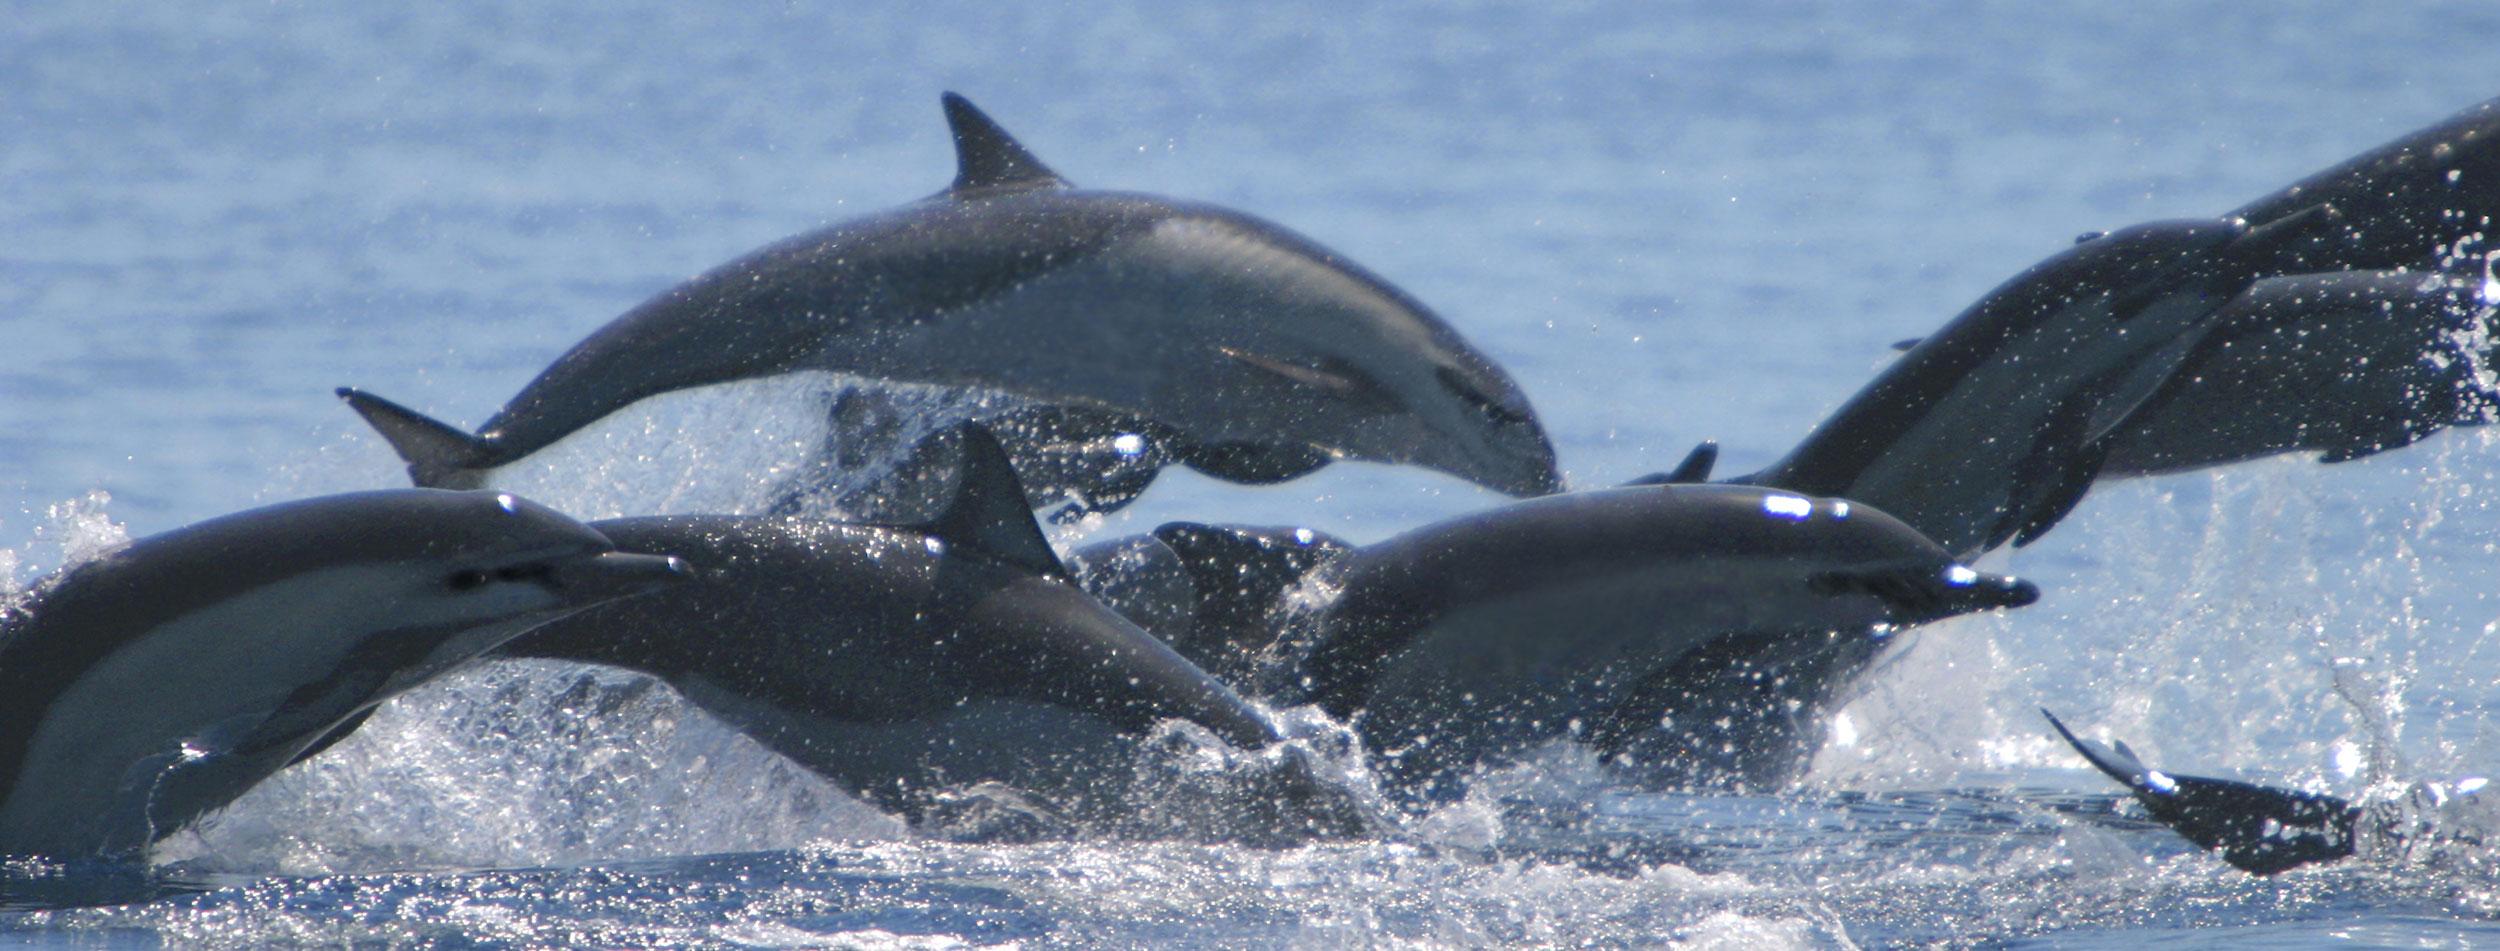 Dolphin Sightseeing & Snorkeling